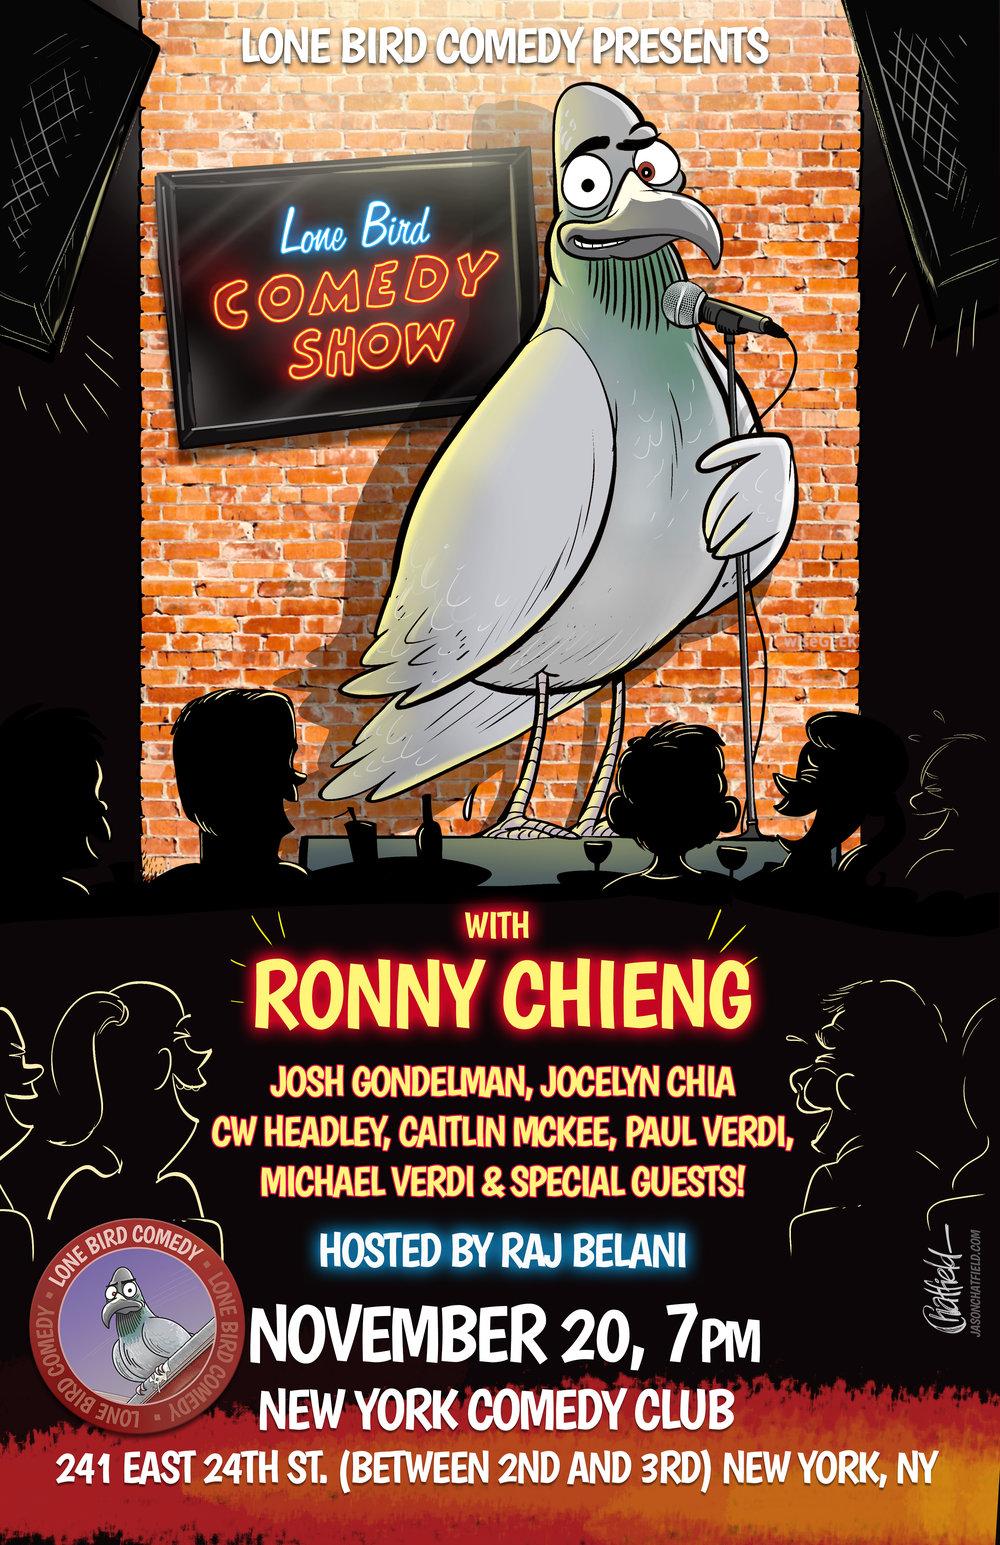 Lone Bird Poster NYCC-11-20 (1).jpg